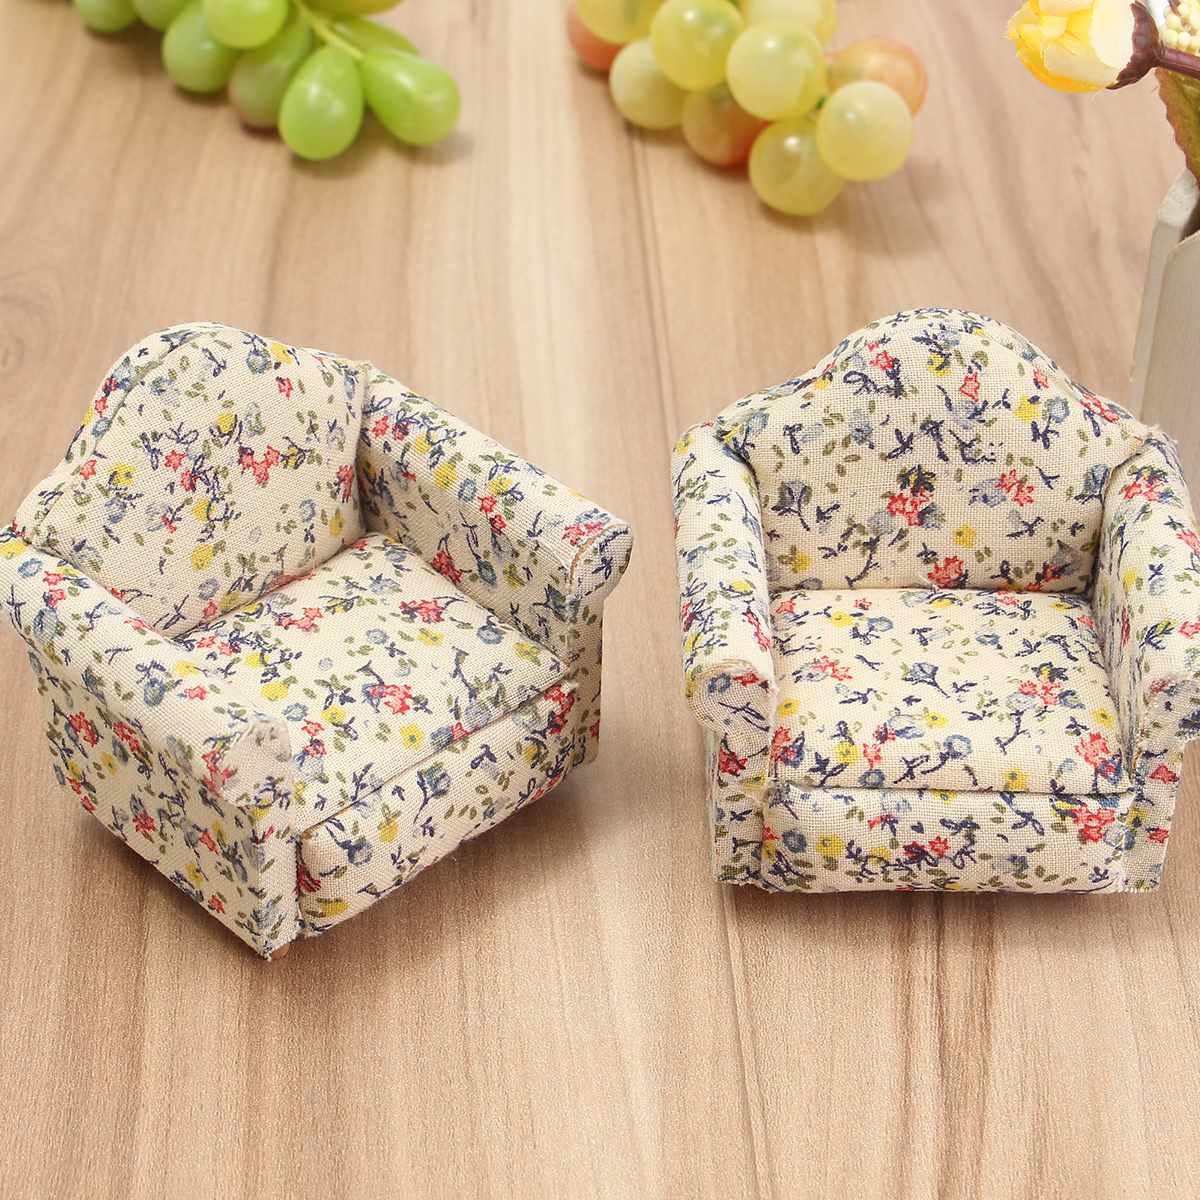 Buy 2pcs Set Floral Pattern Flower